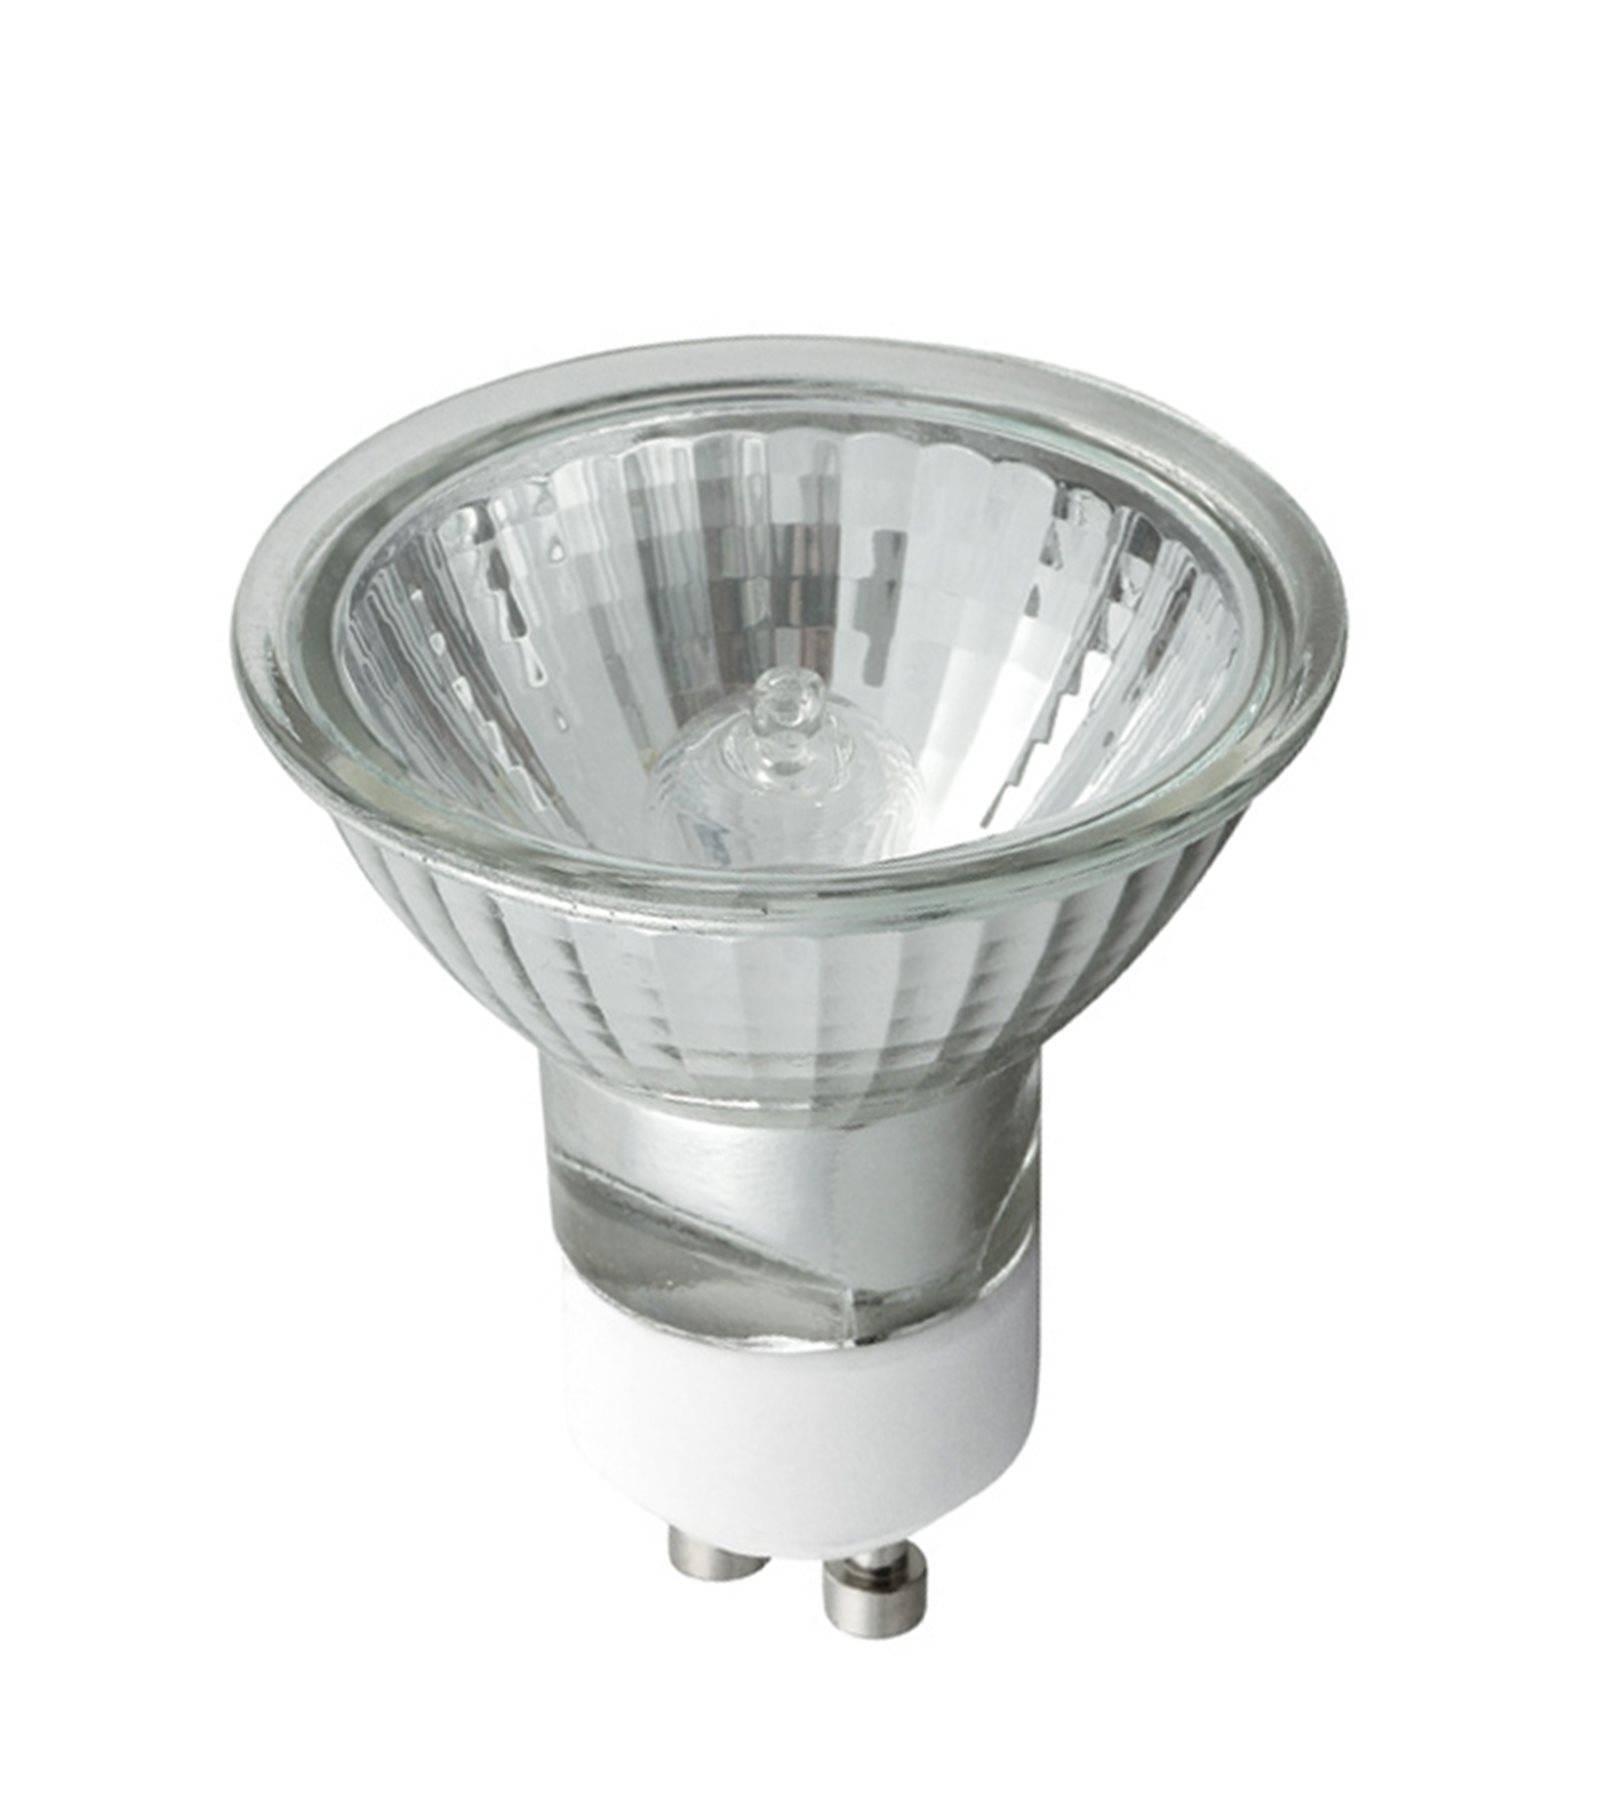 ampoule halog ne gu10 20w 110lm blanc chaud 60 kanlux ampoule halogene siageo. Black Bedroom Furniture Sets. Home Design Ideas